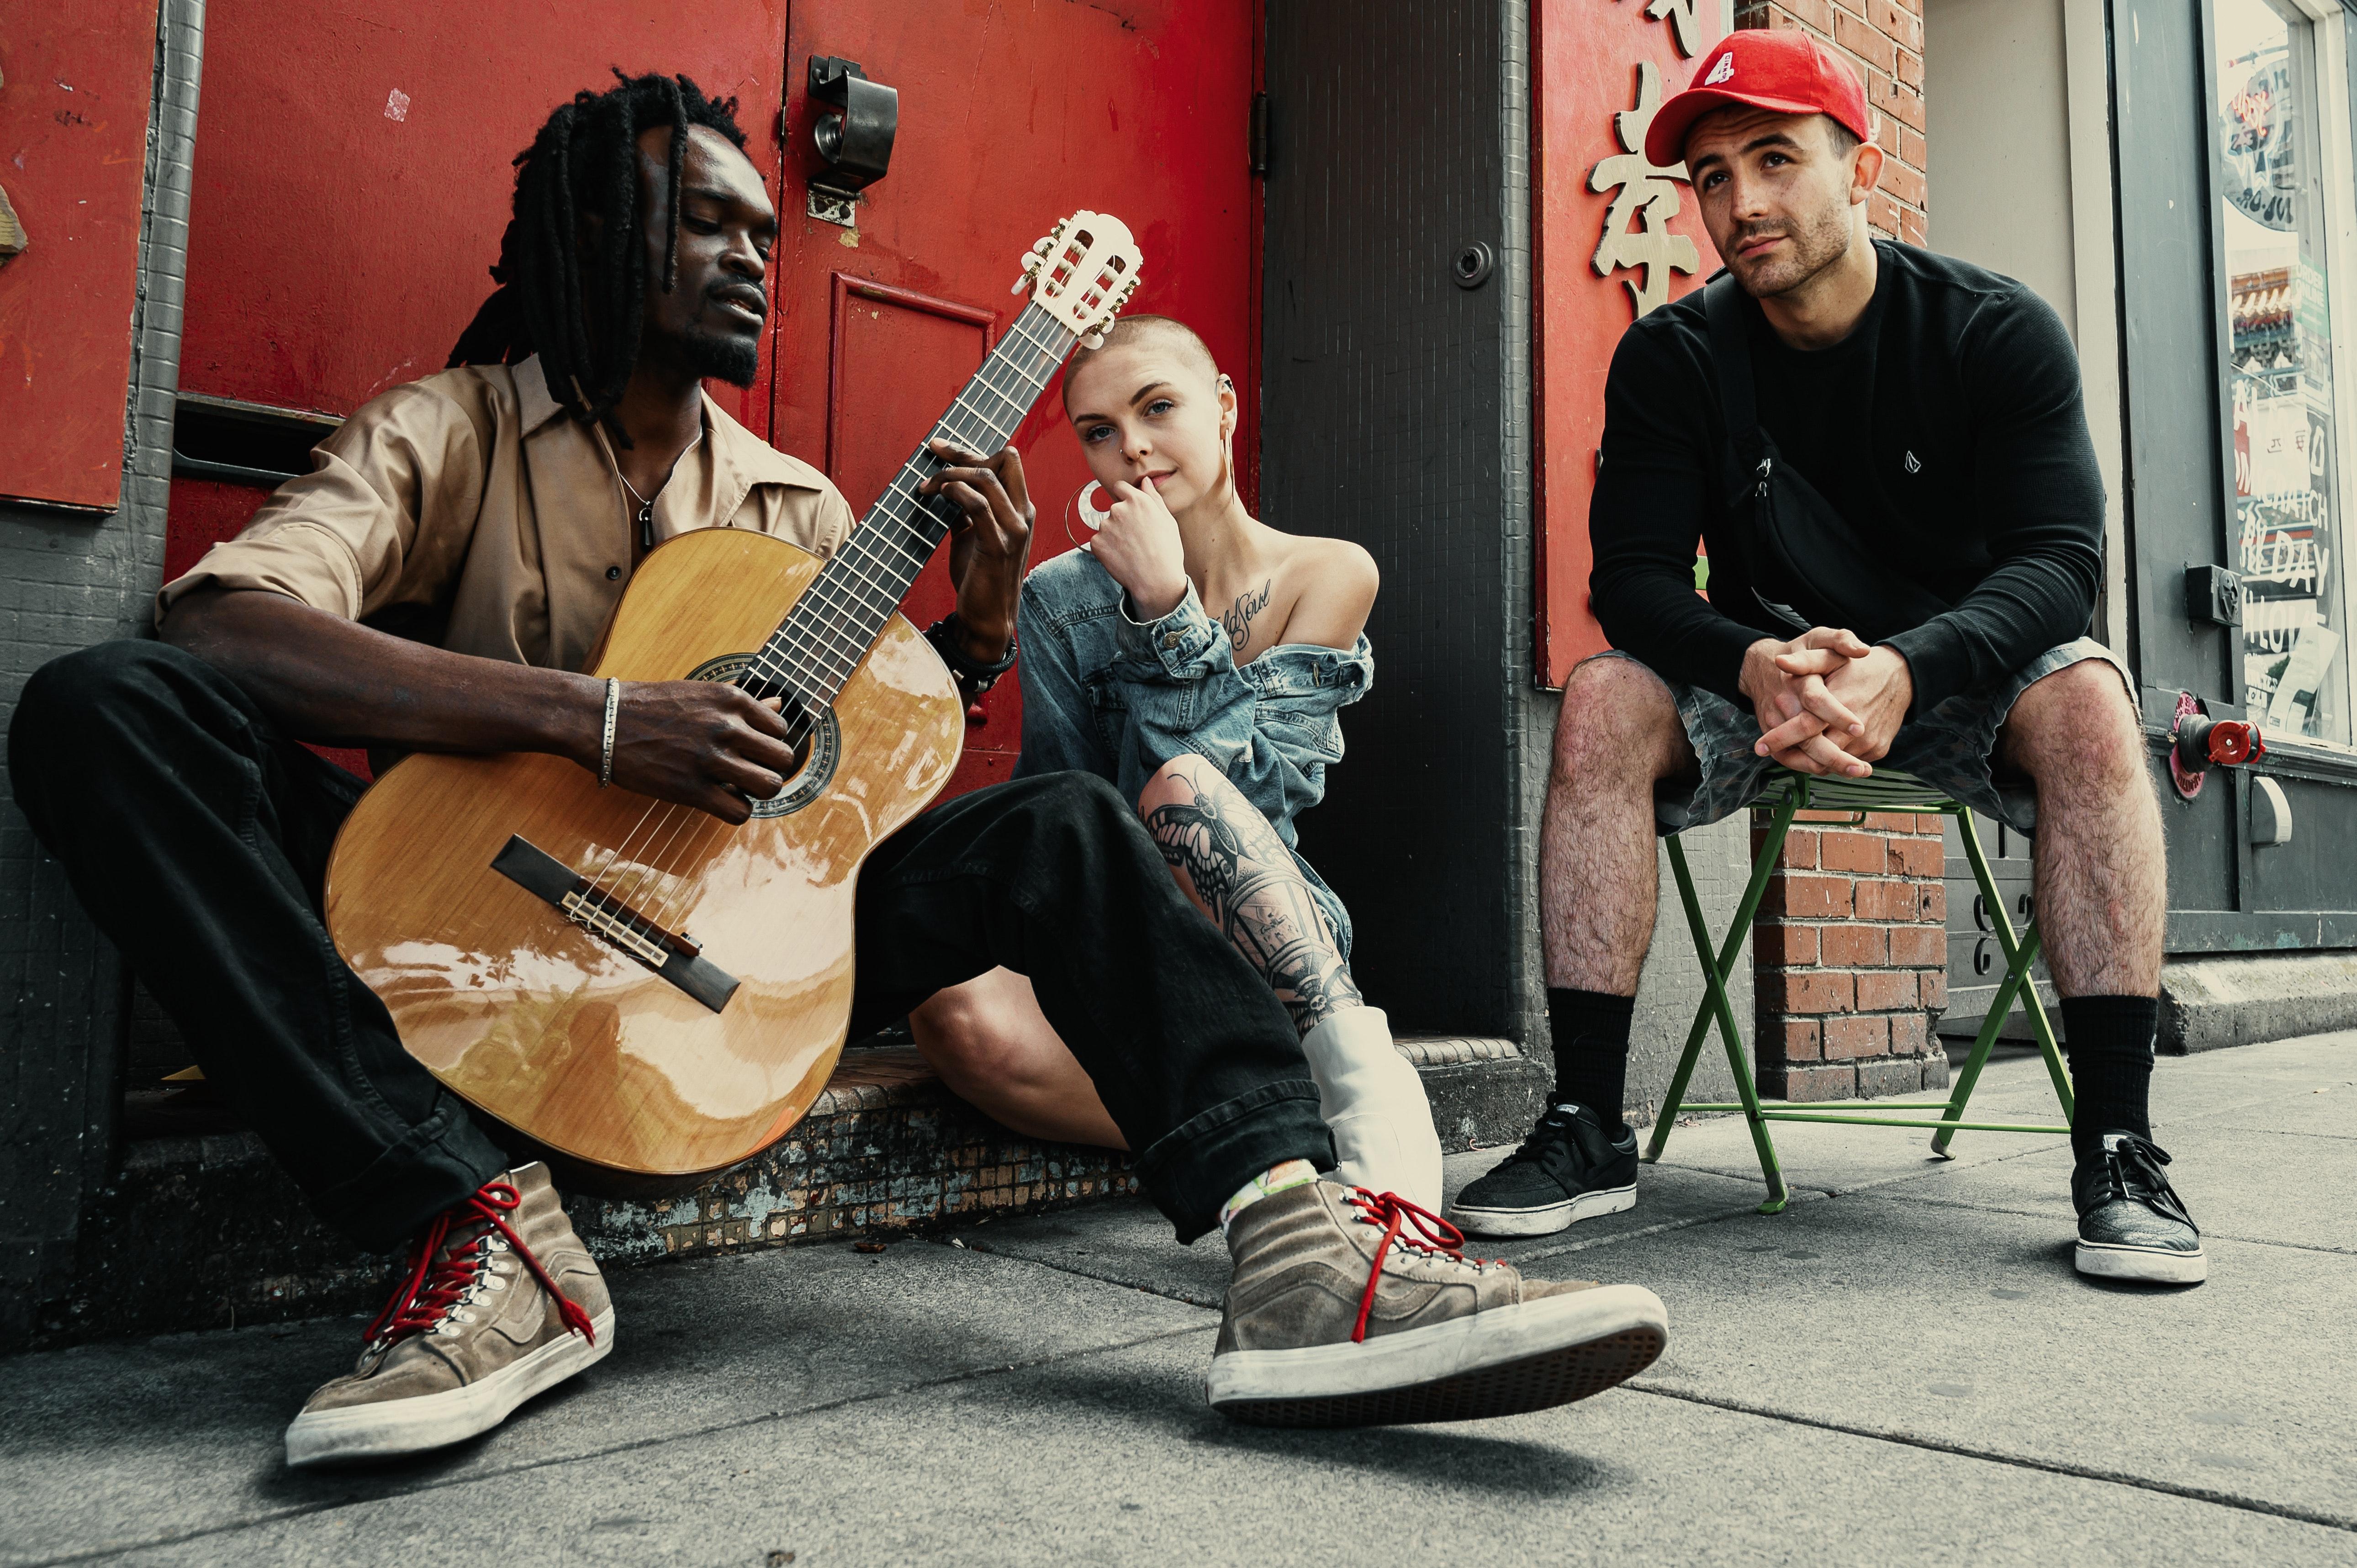 artist-band-diversity-2479312.jpg